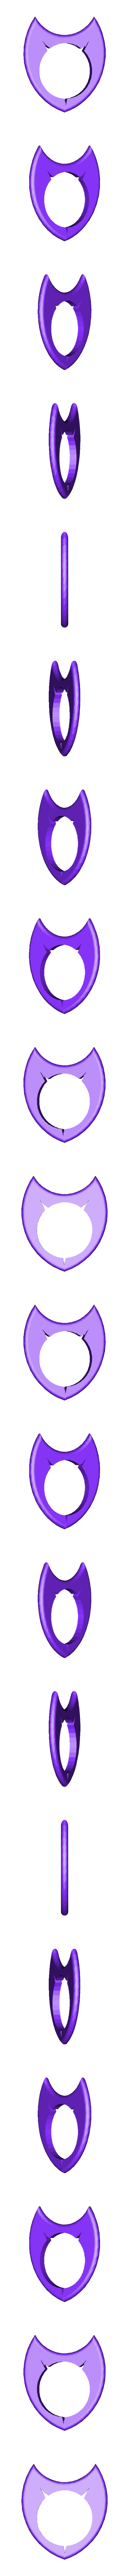 DUA-Lisa ElasticCentrePiramidal 2'30 07.stl Download free STL file DUA-Dent / Smooth ElasticCentreOctogonal/Pyramidal Curve 2'30mm • 3D printing template, carleslluisar